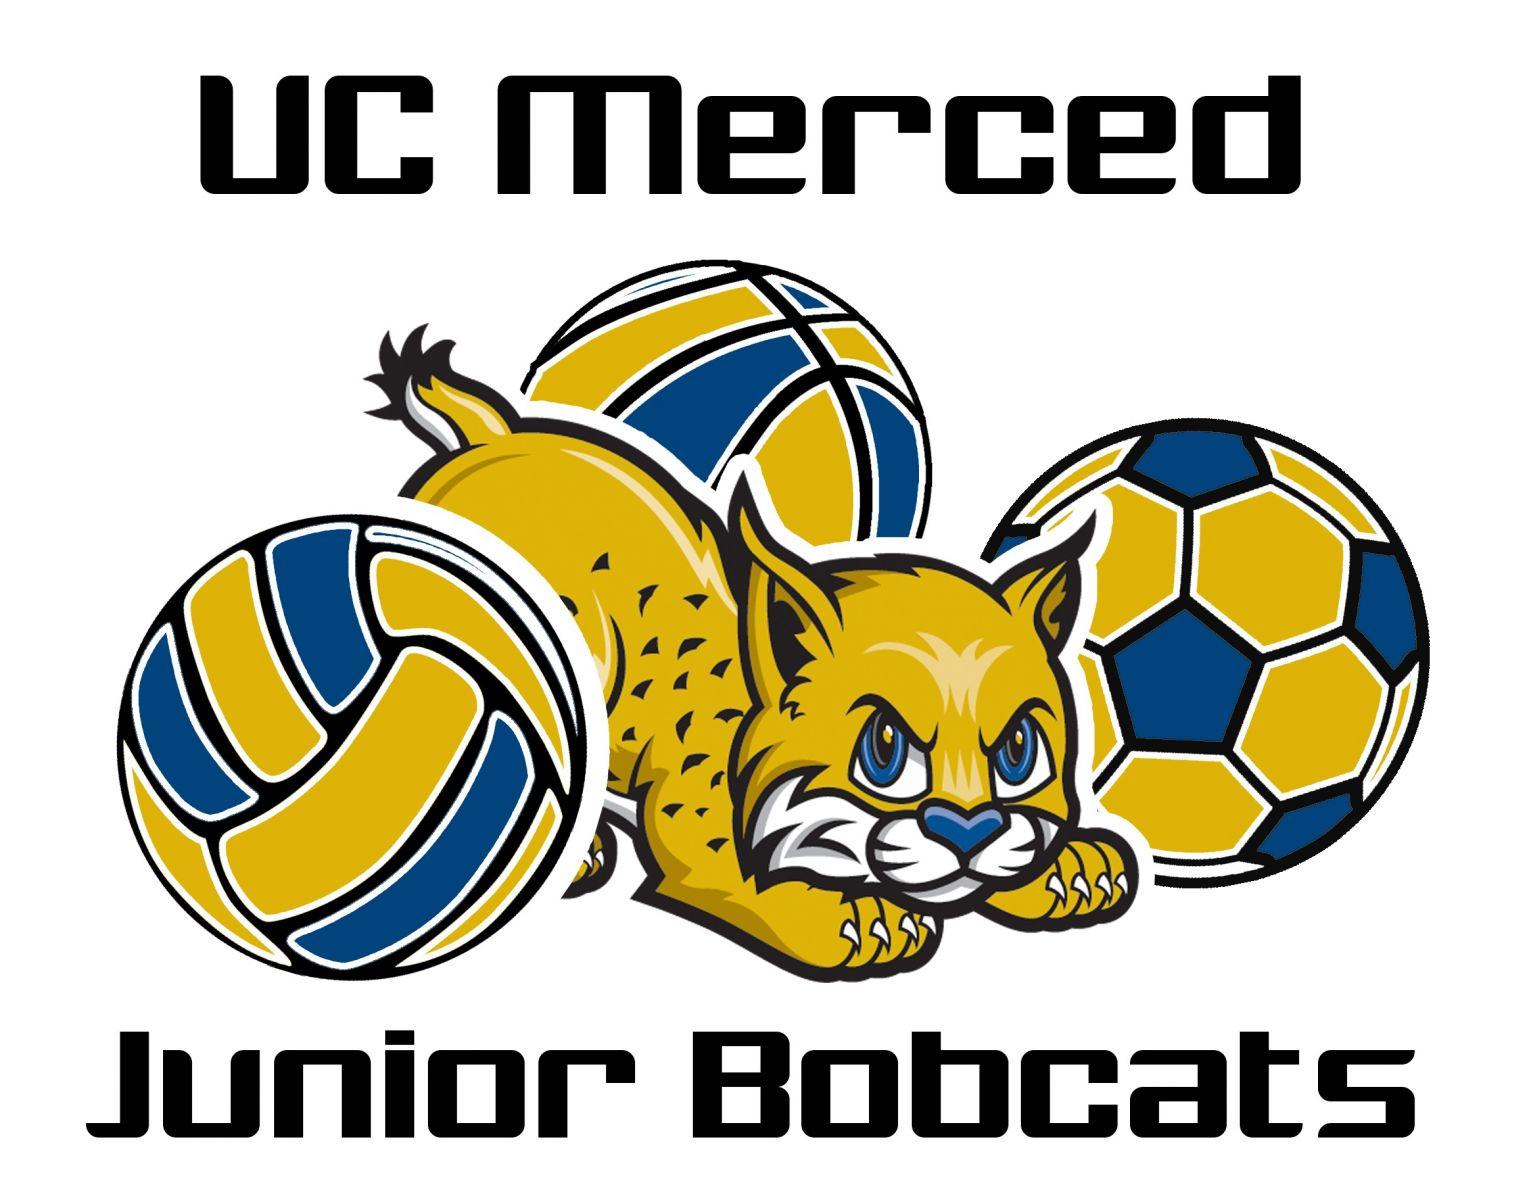 Bobcat clipart uc merced. University of california junior